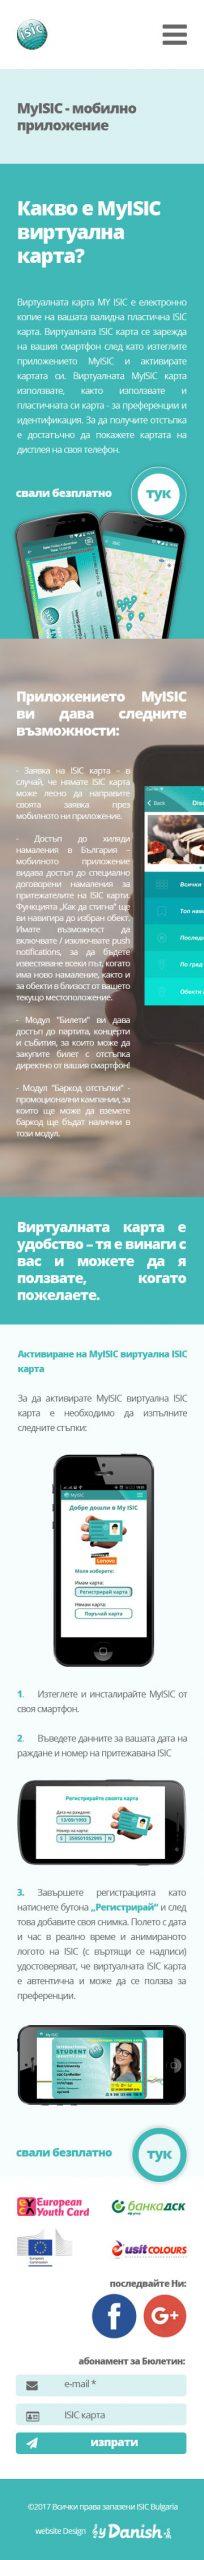 ISIC International Student Identity Card website design